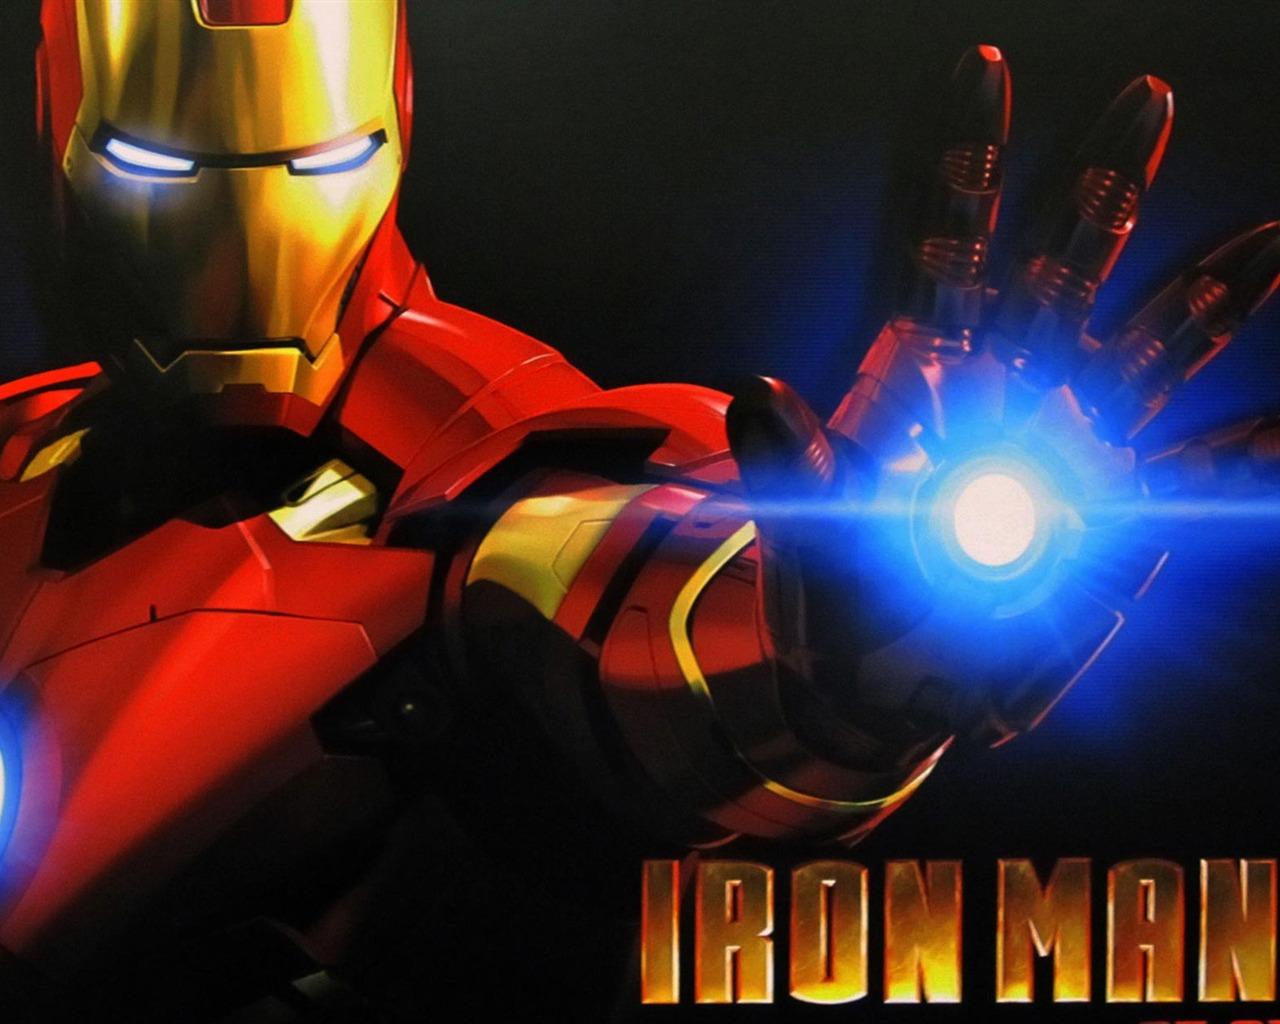 Fond d 39 cran iron man 2 hd 23 1280x1024 fond d 39 cran - Iron man 2 telecharger gratuit ...